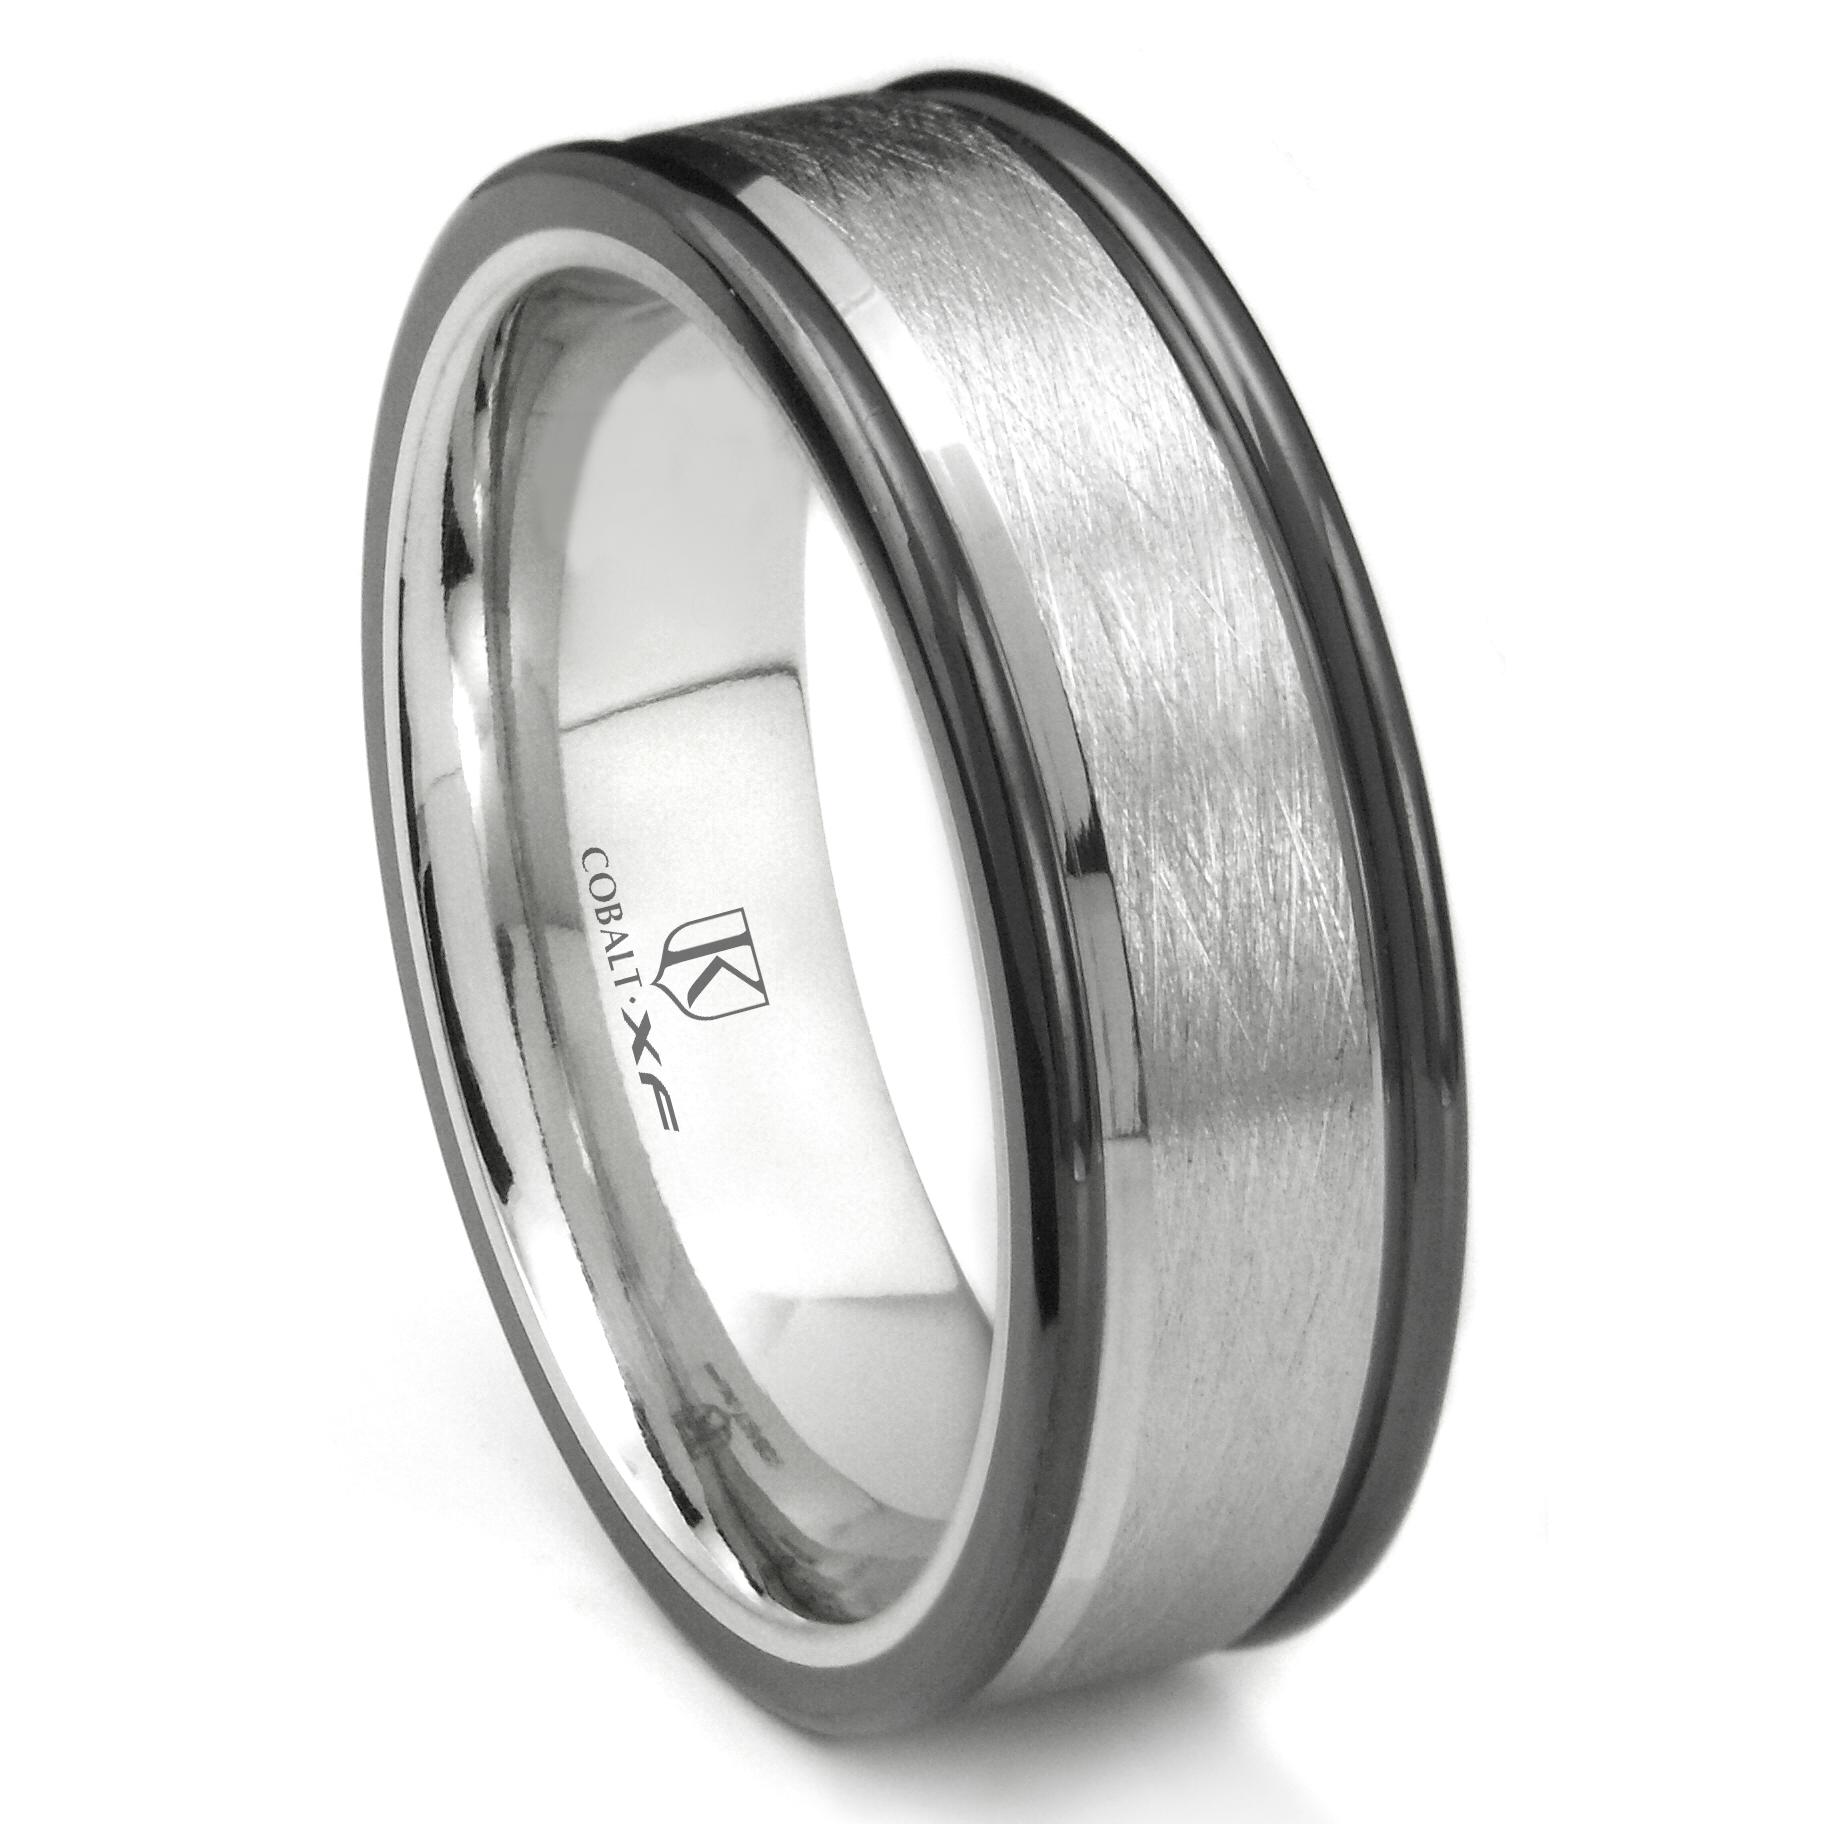 Cobalt XF Chrome 8MM Italian Di Seta Finish Two Tone Wedding Band Ring P cobalt wedding band Home Cobalt Rings Loading zoom